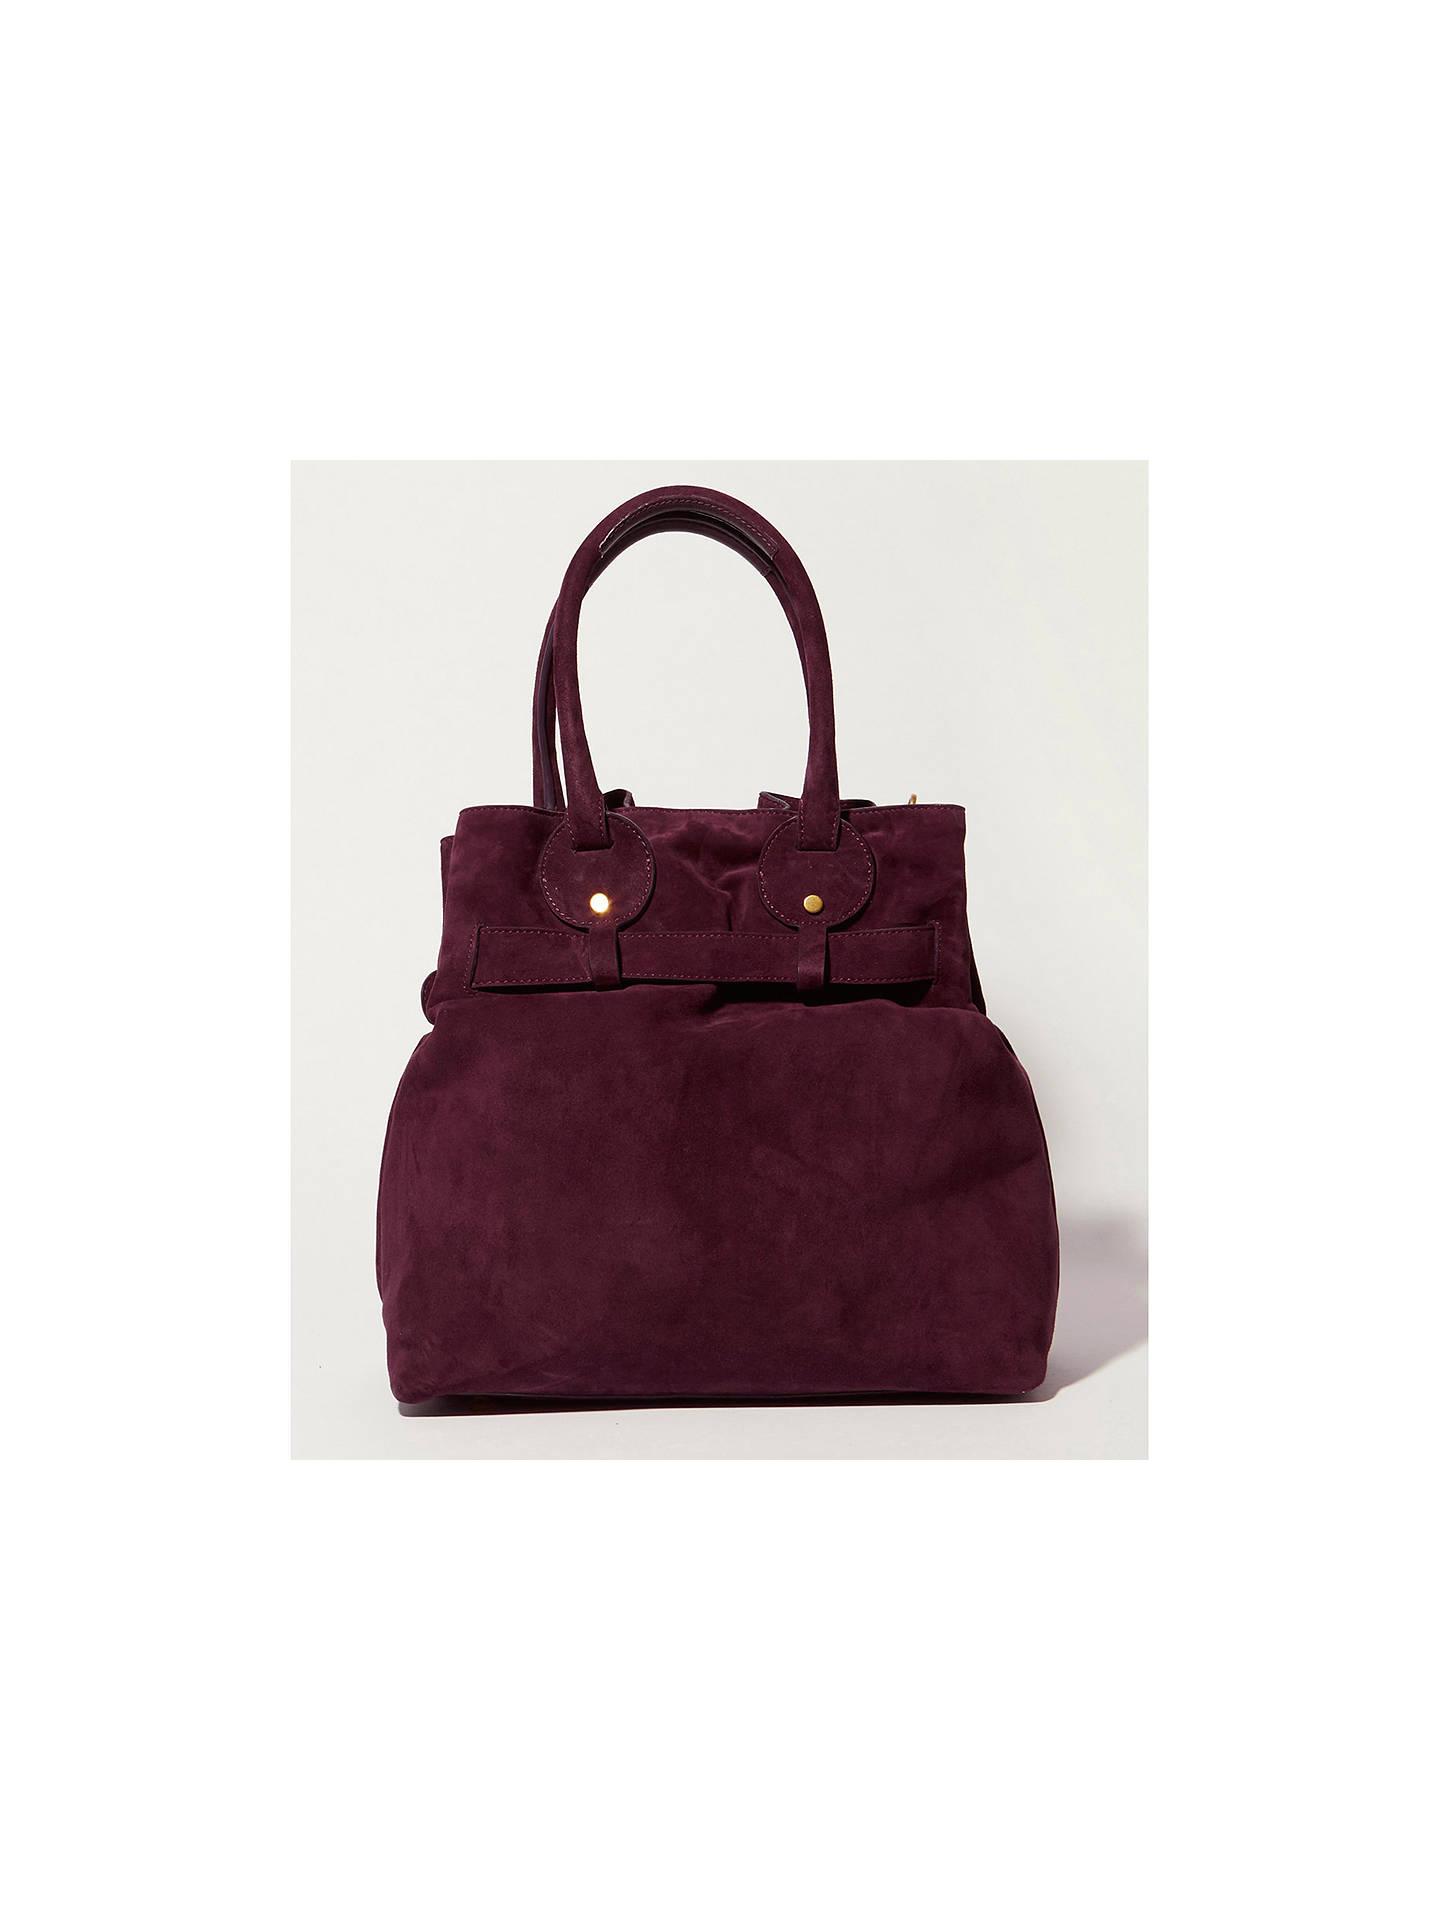 887c92f8e7 ... Buy Karen Millen Suede Studded Slouch Bag